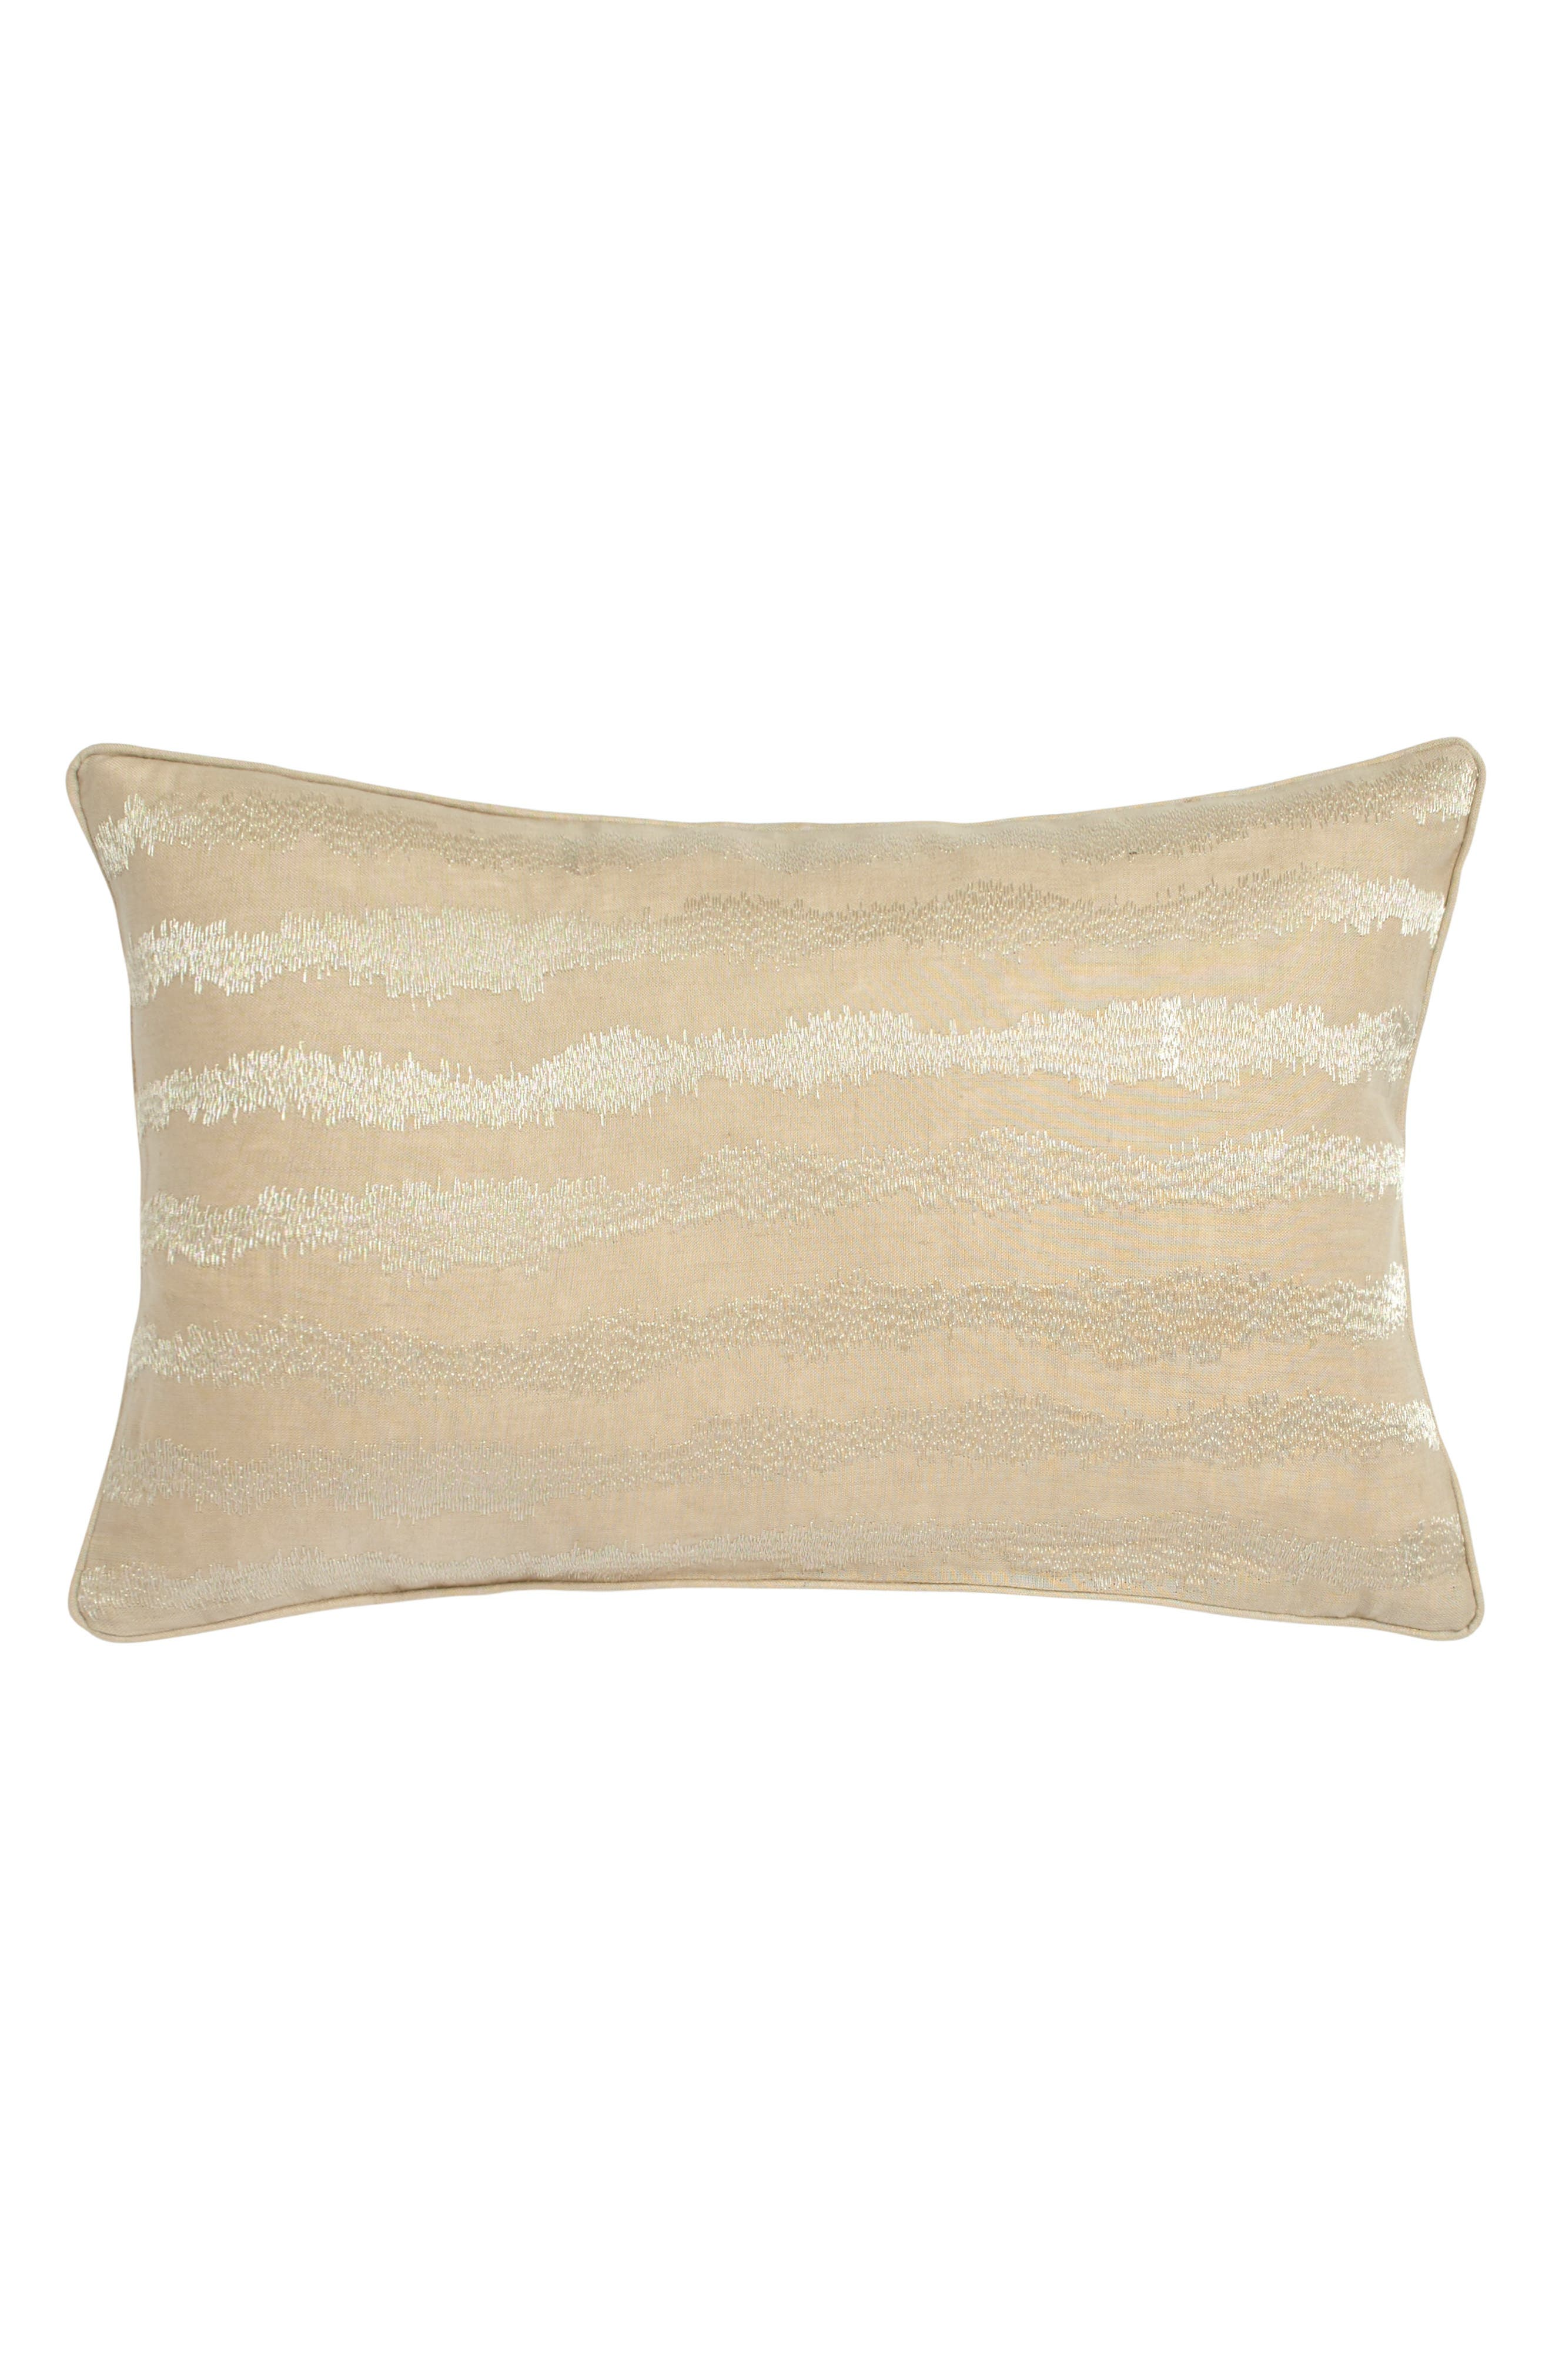 Makrana Accent Pillow,                             Main thumbnail 1, color,                             GREY